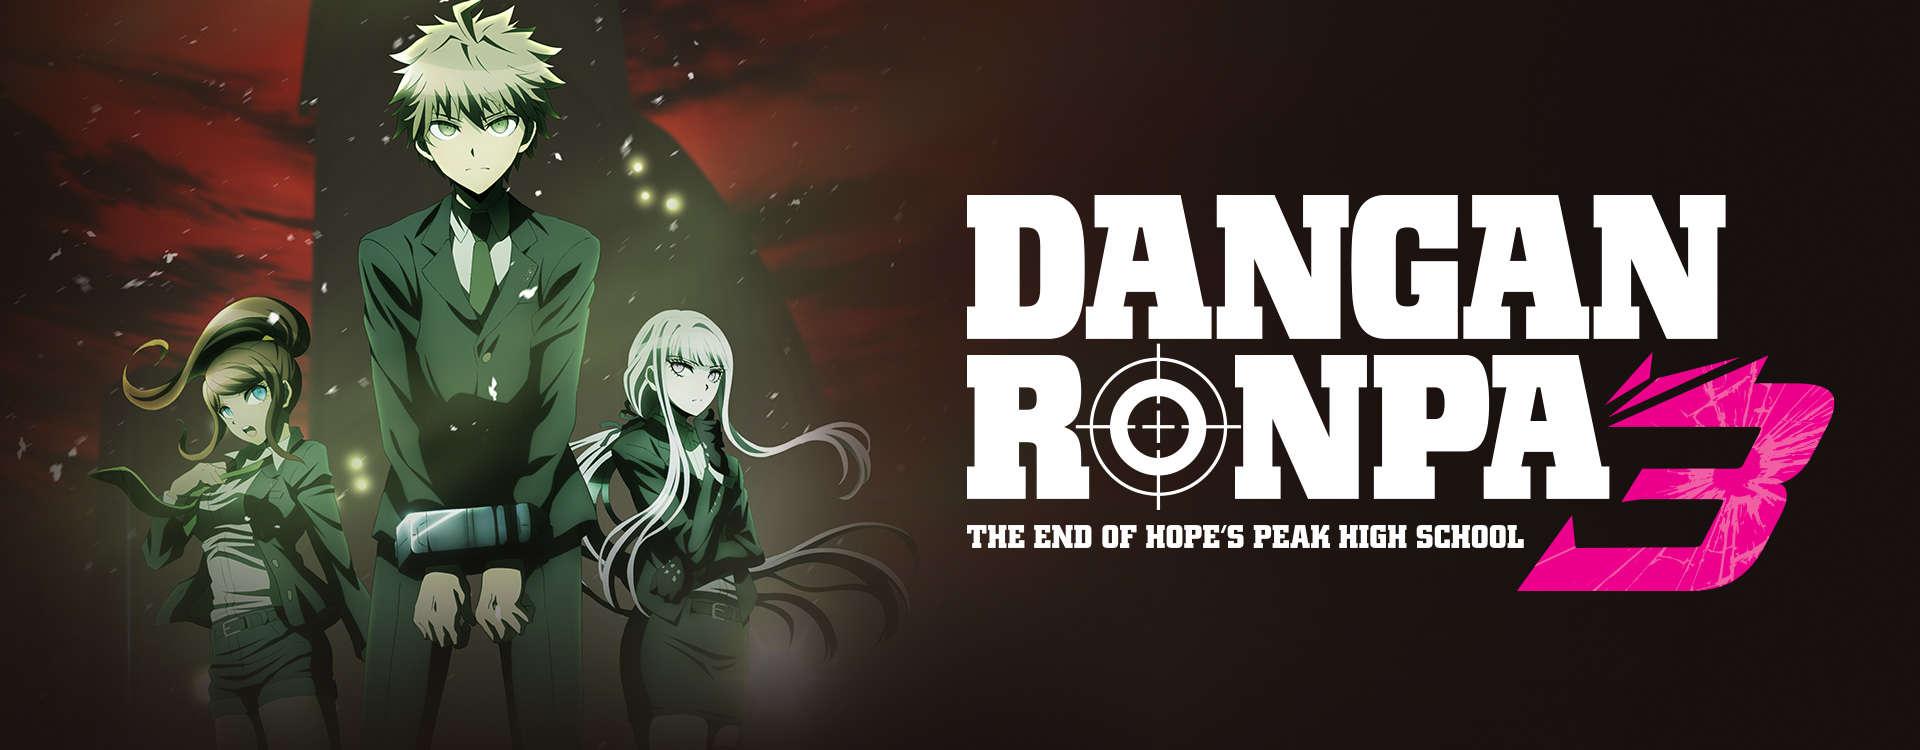 Danganronpa 3: The End of Hope's Peak High School